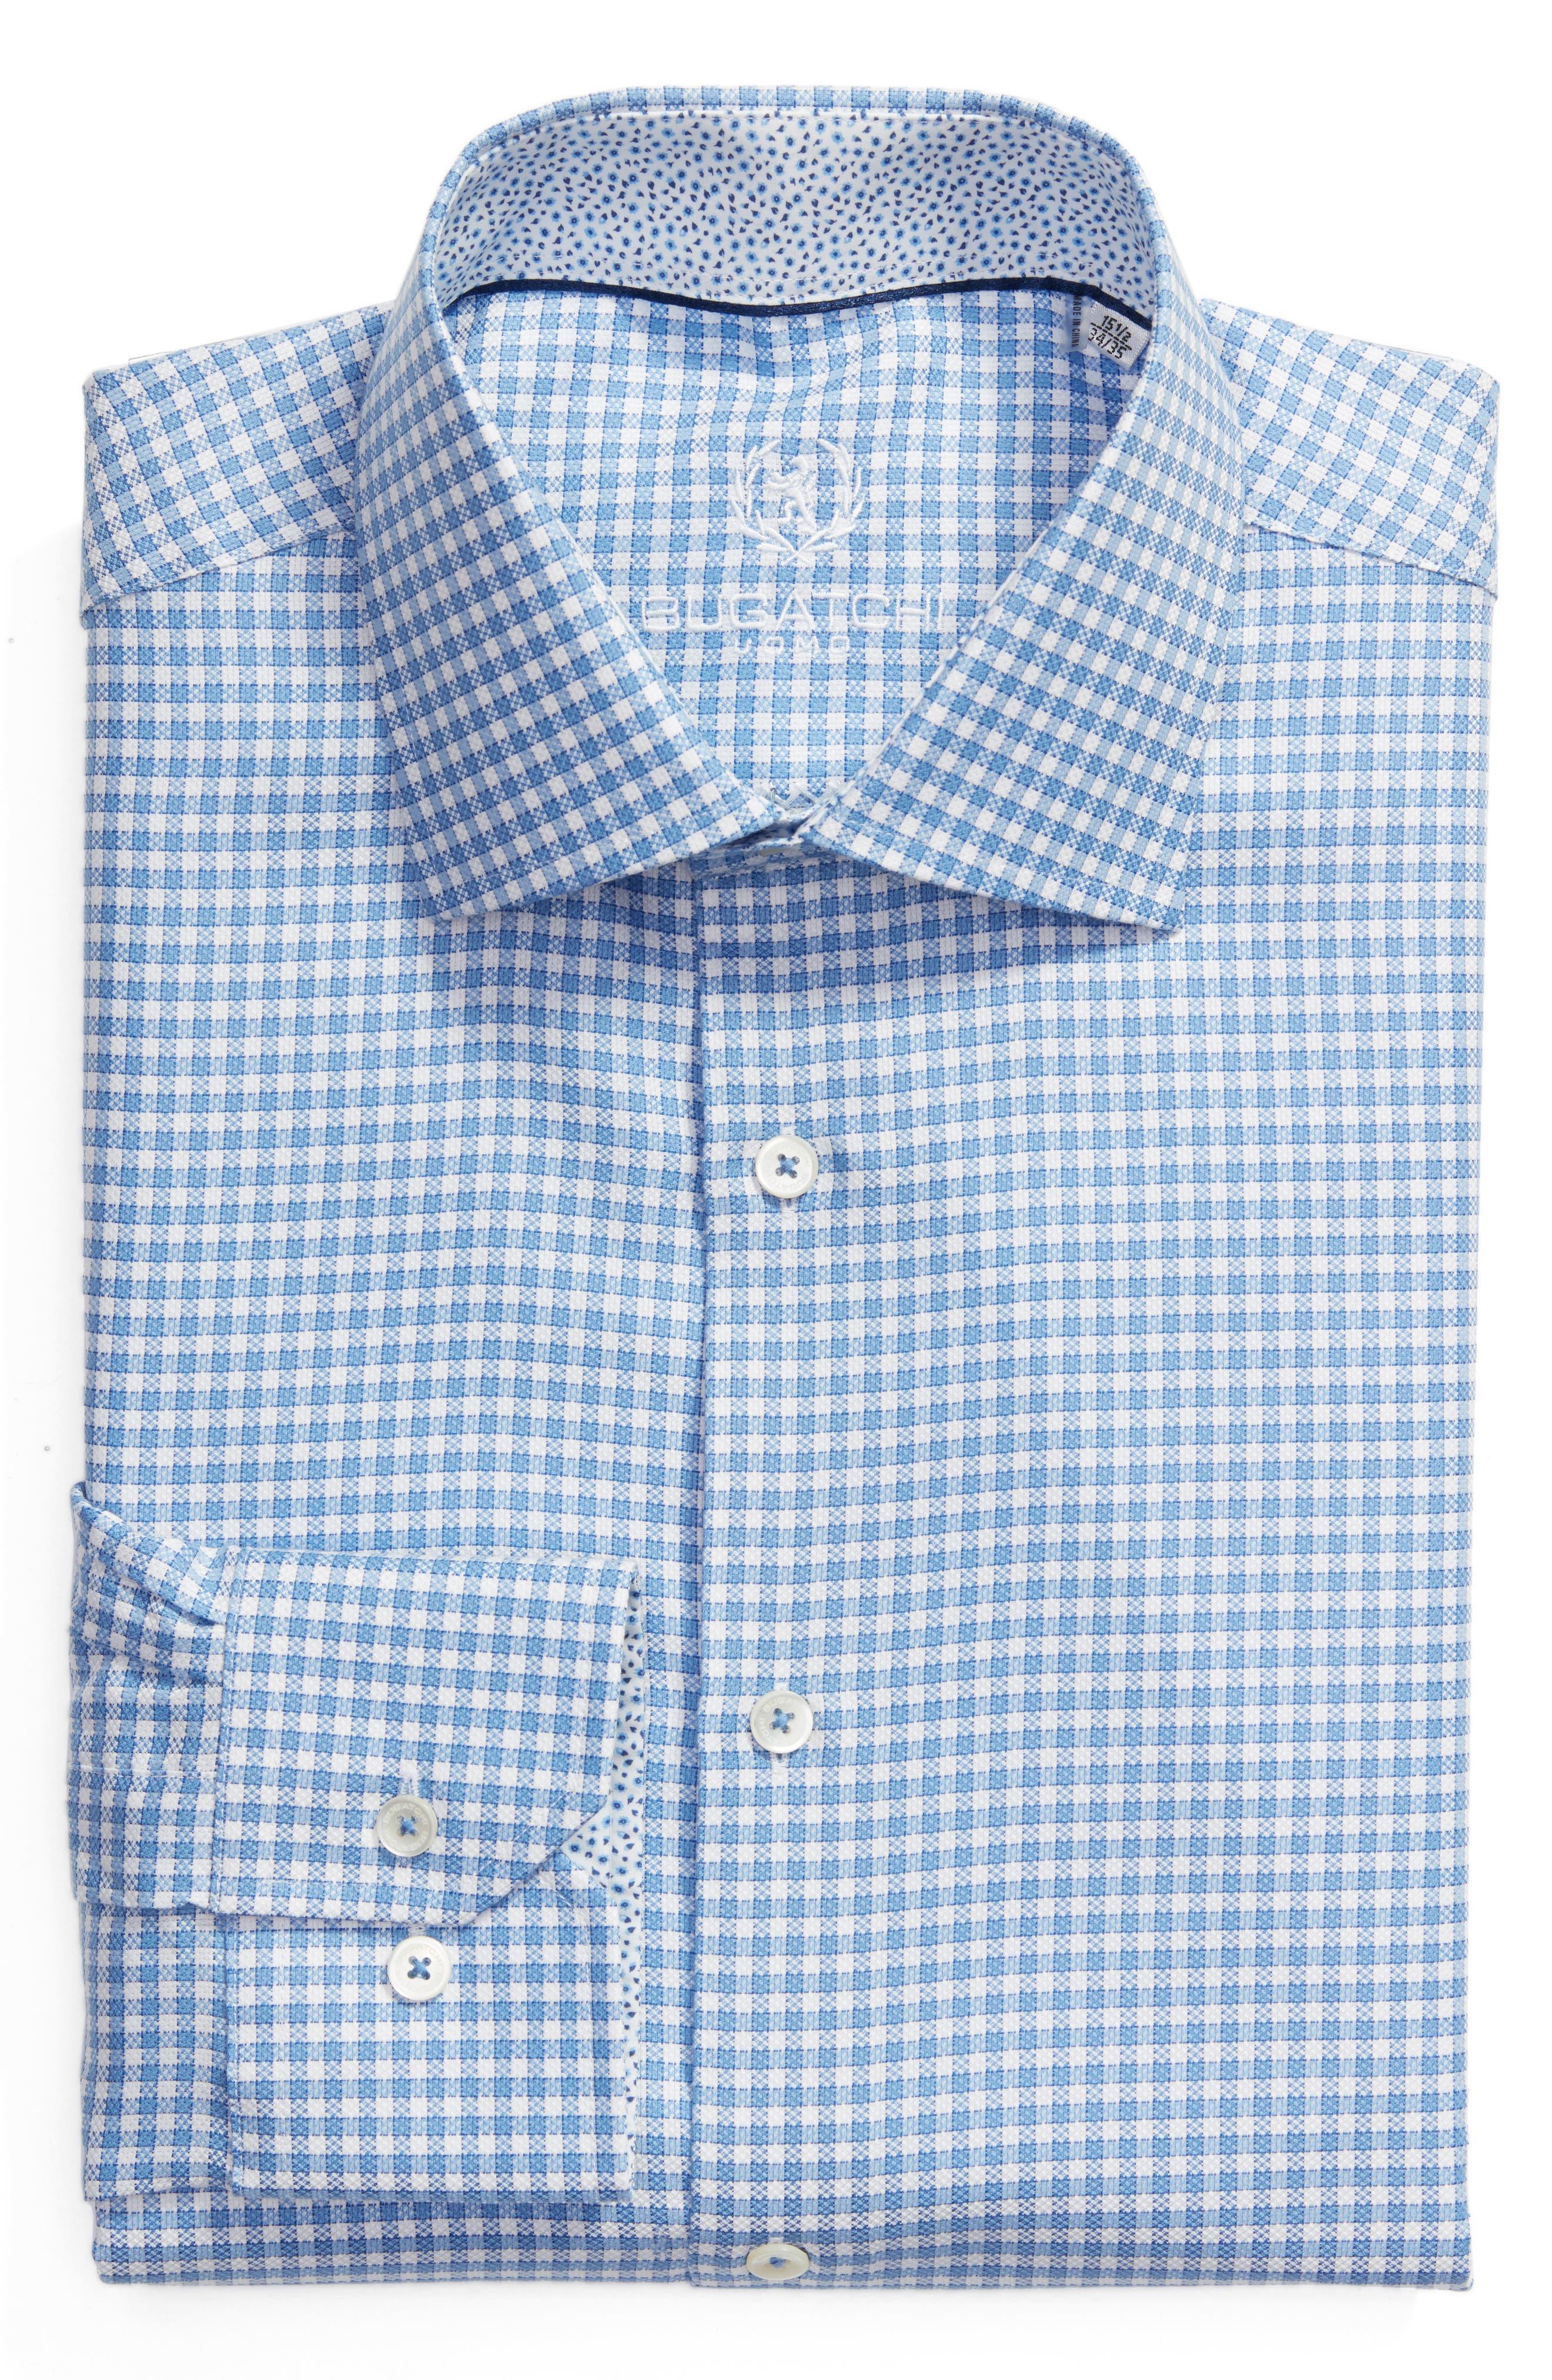 Trim Fit Check Dress Shirt,                             Main thumbnail 1, color,                             459